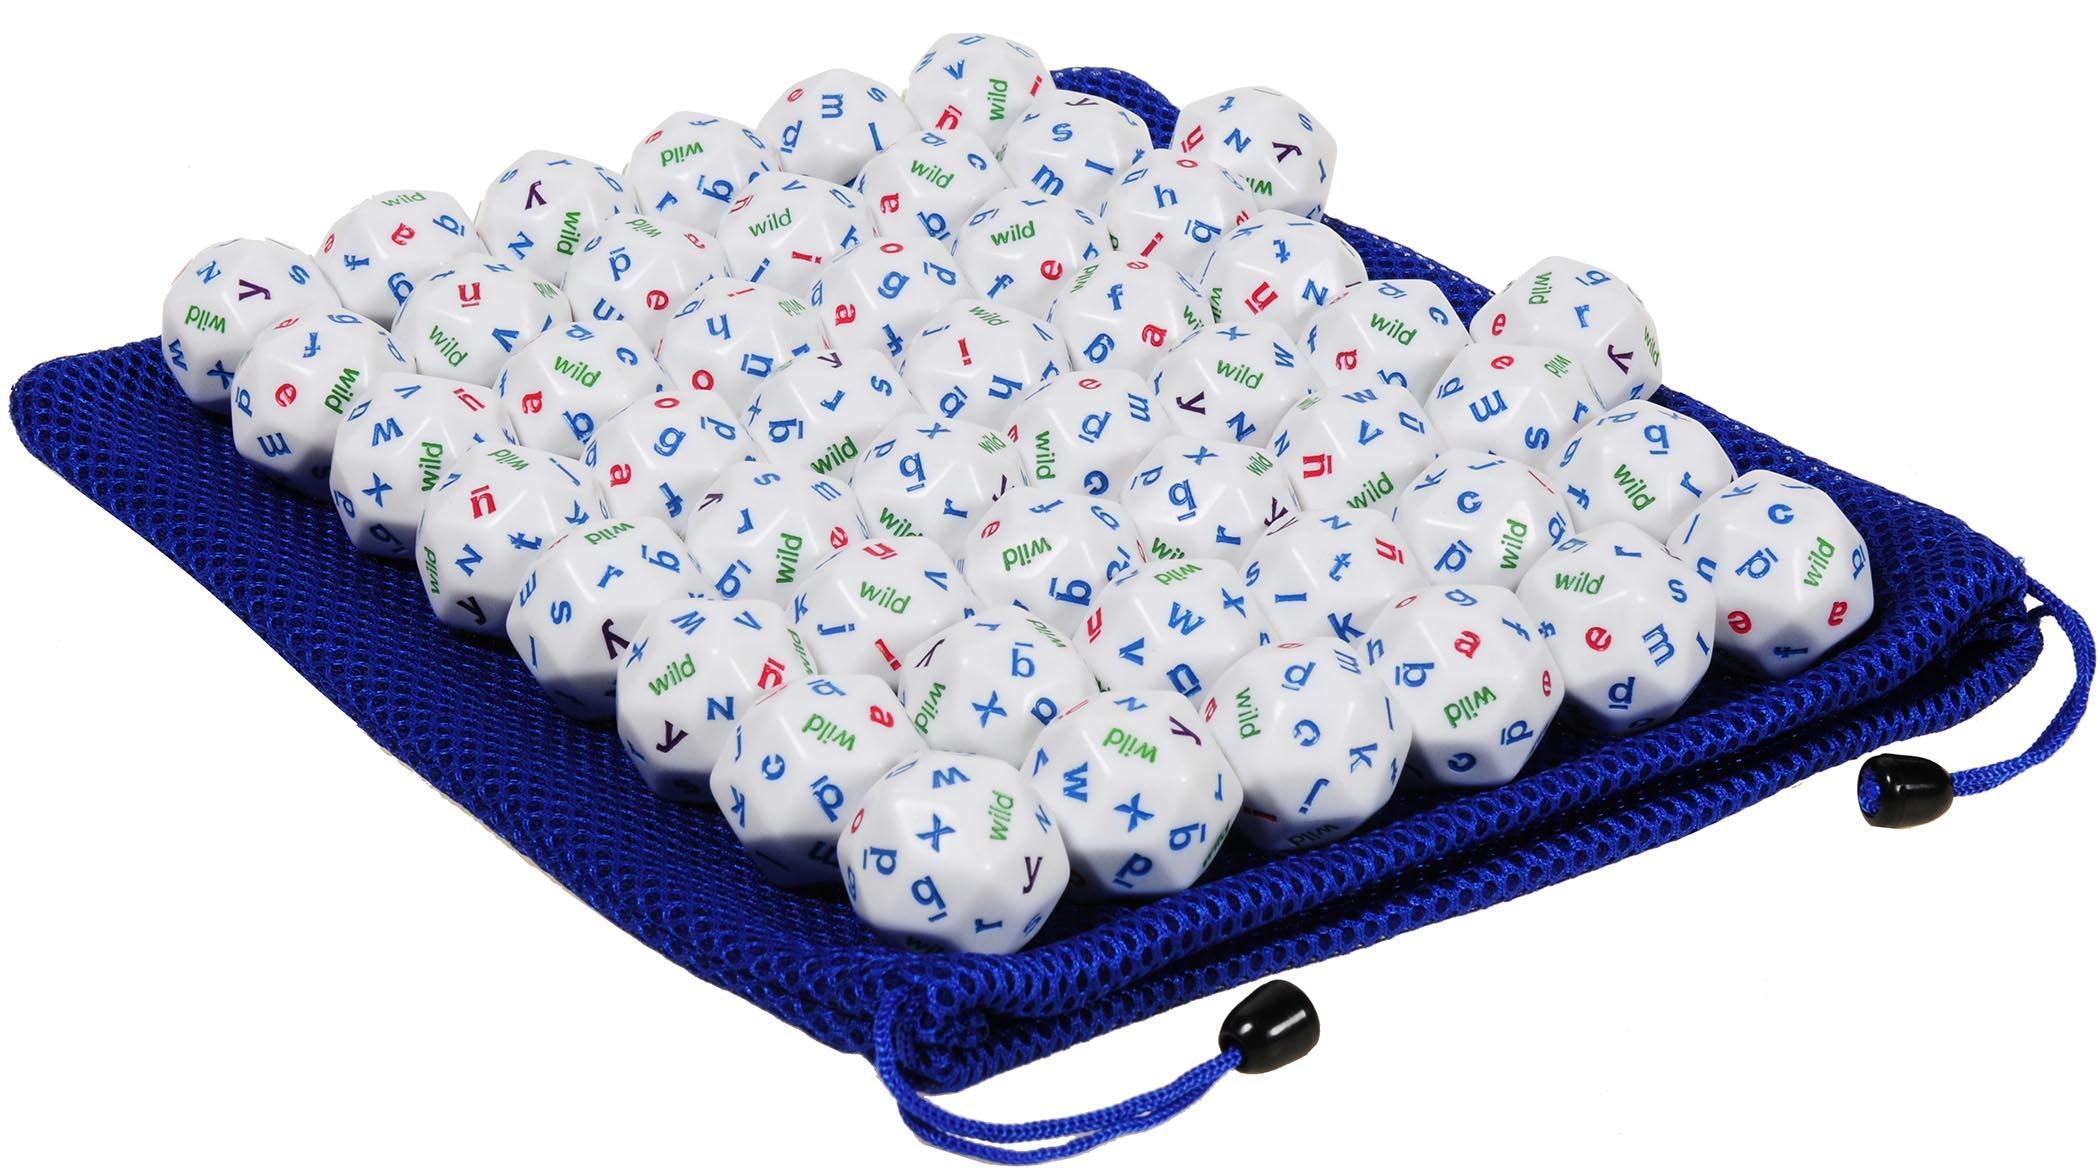 Alphabet Jumbo Dice, 30-Sided, Teacher Pack Set of 50 Dice || Bonus Blue Nylon Drawstring Carry Bag